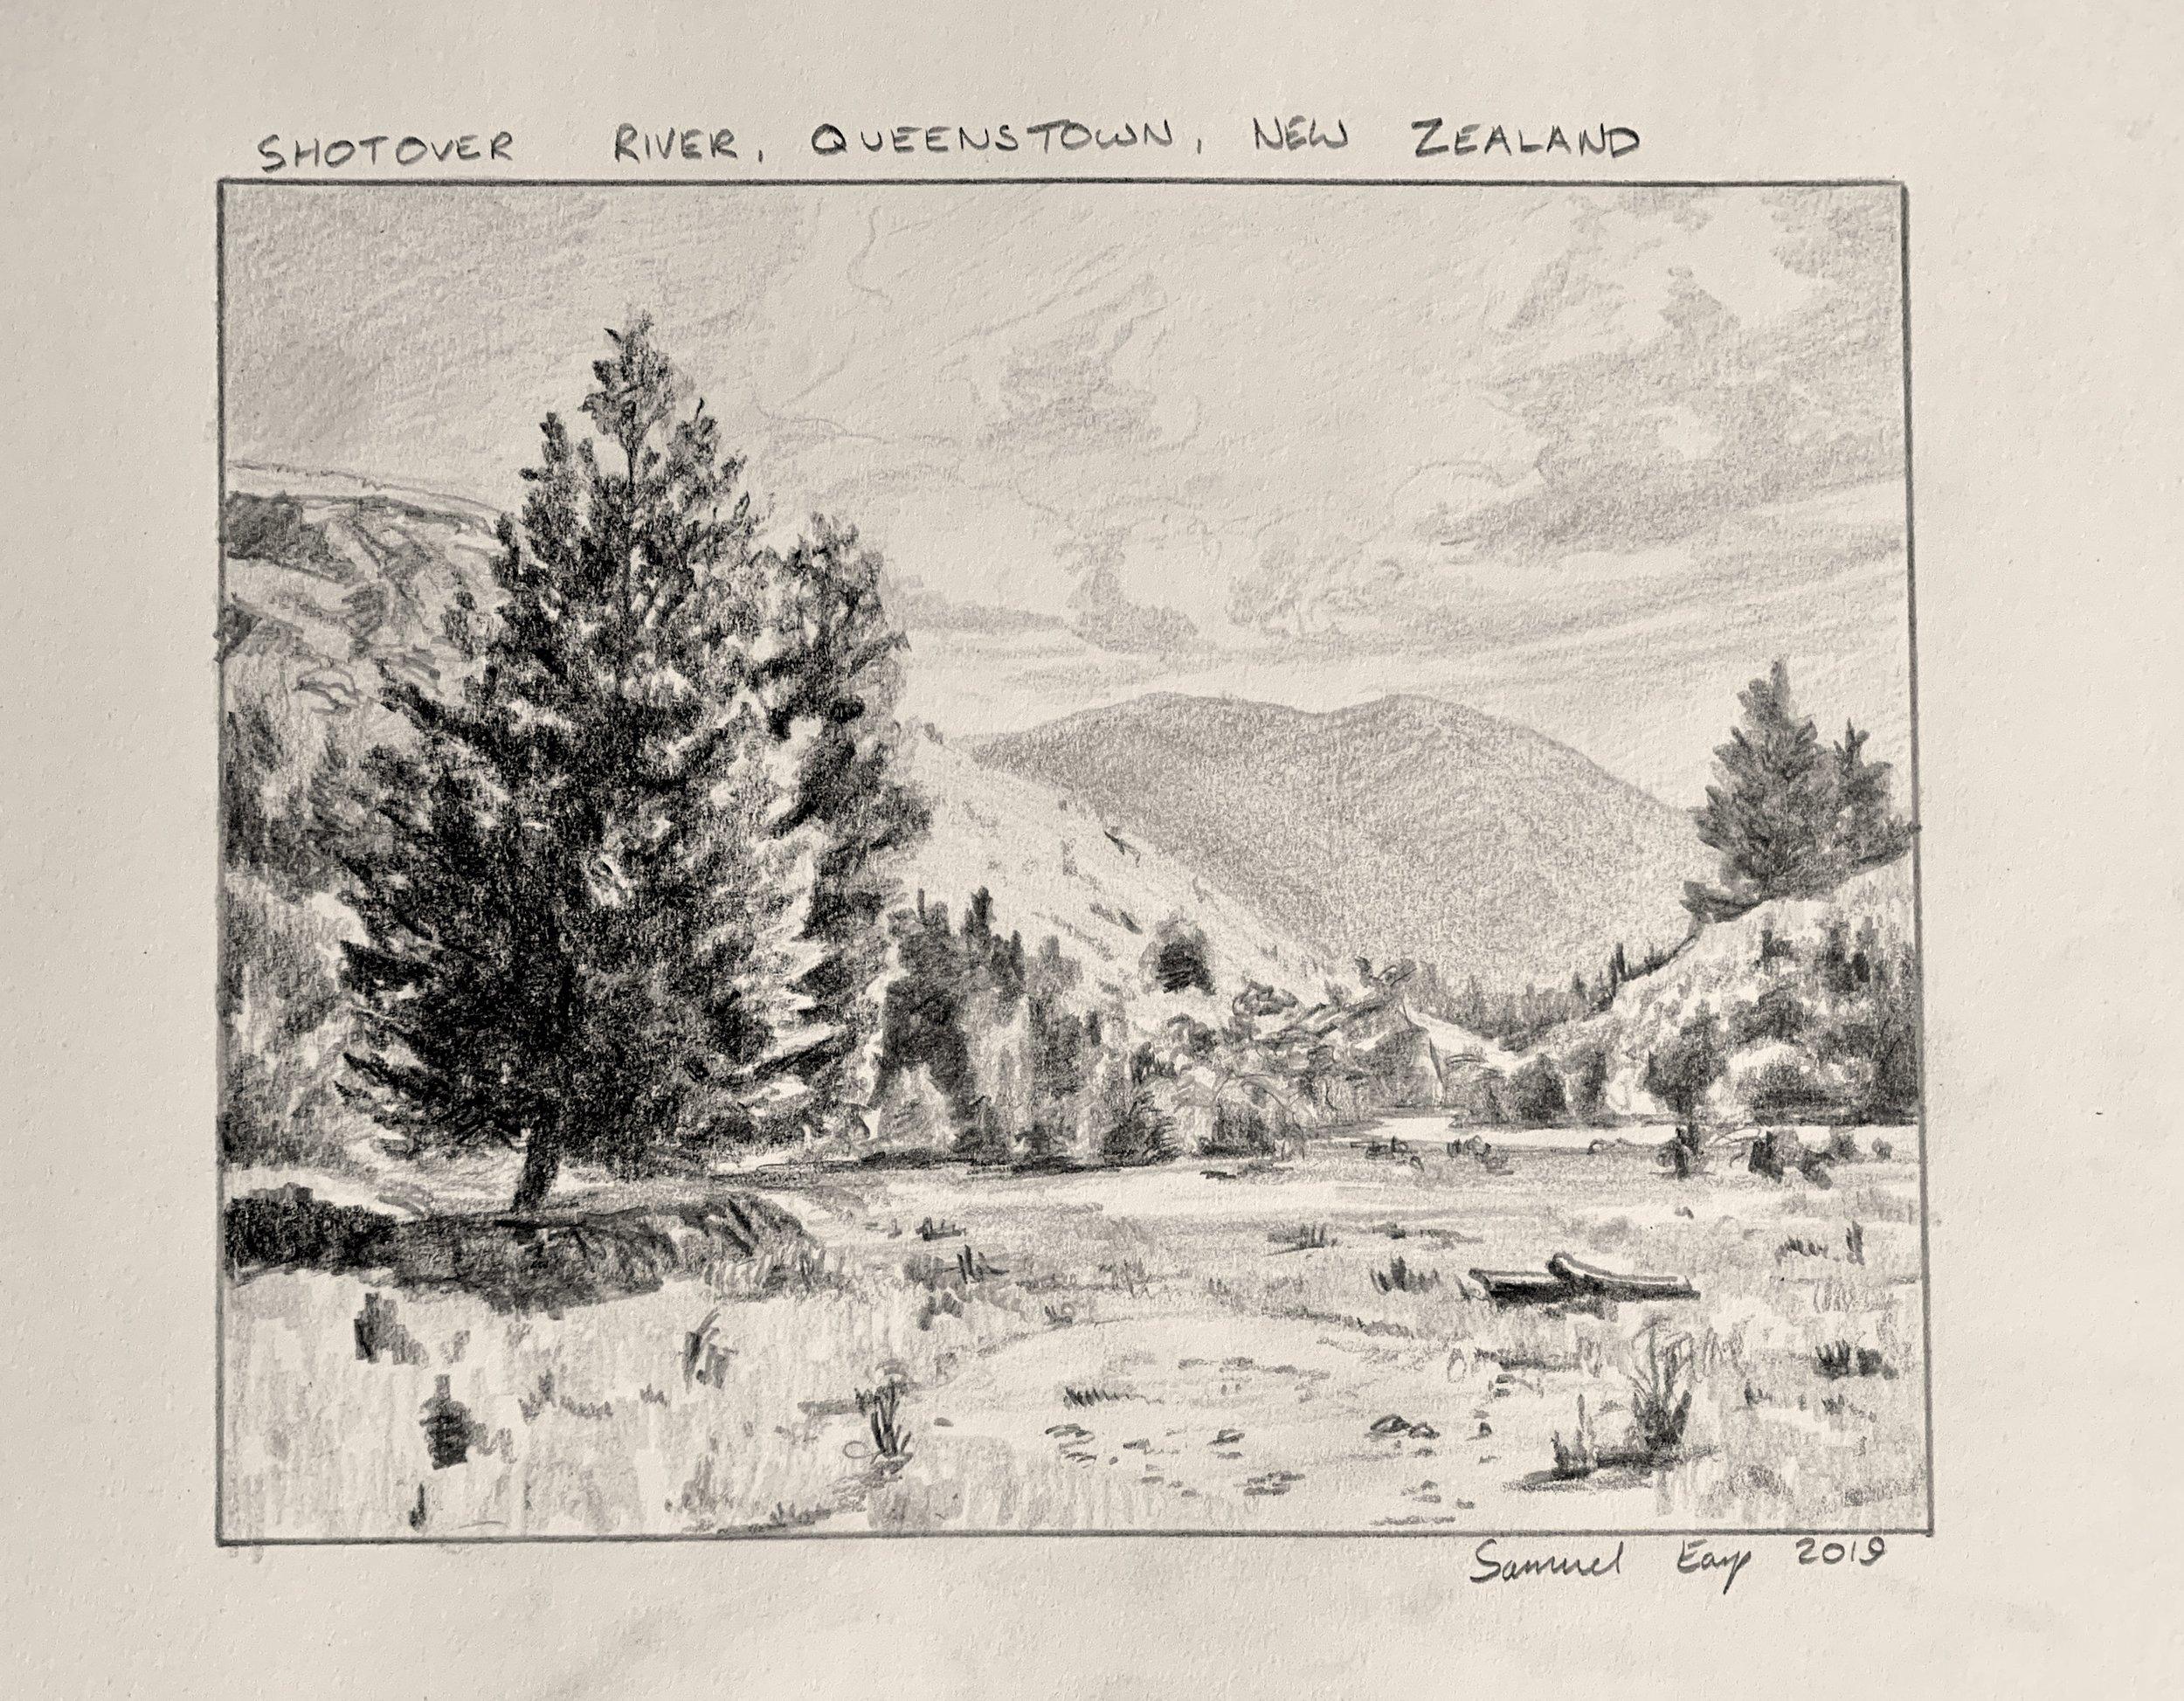 Shotover River - Queenstown - New Zealand - pencil drawing - Samuel Earp.jpeg